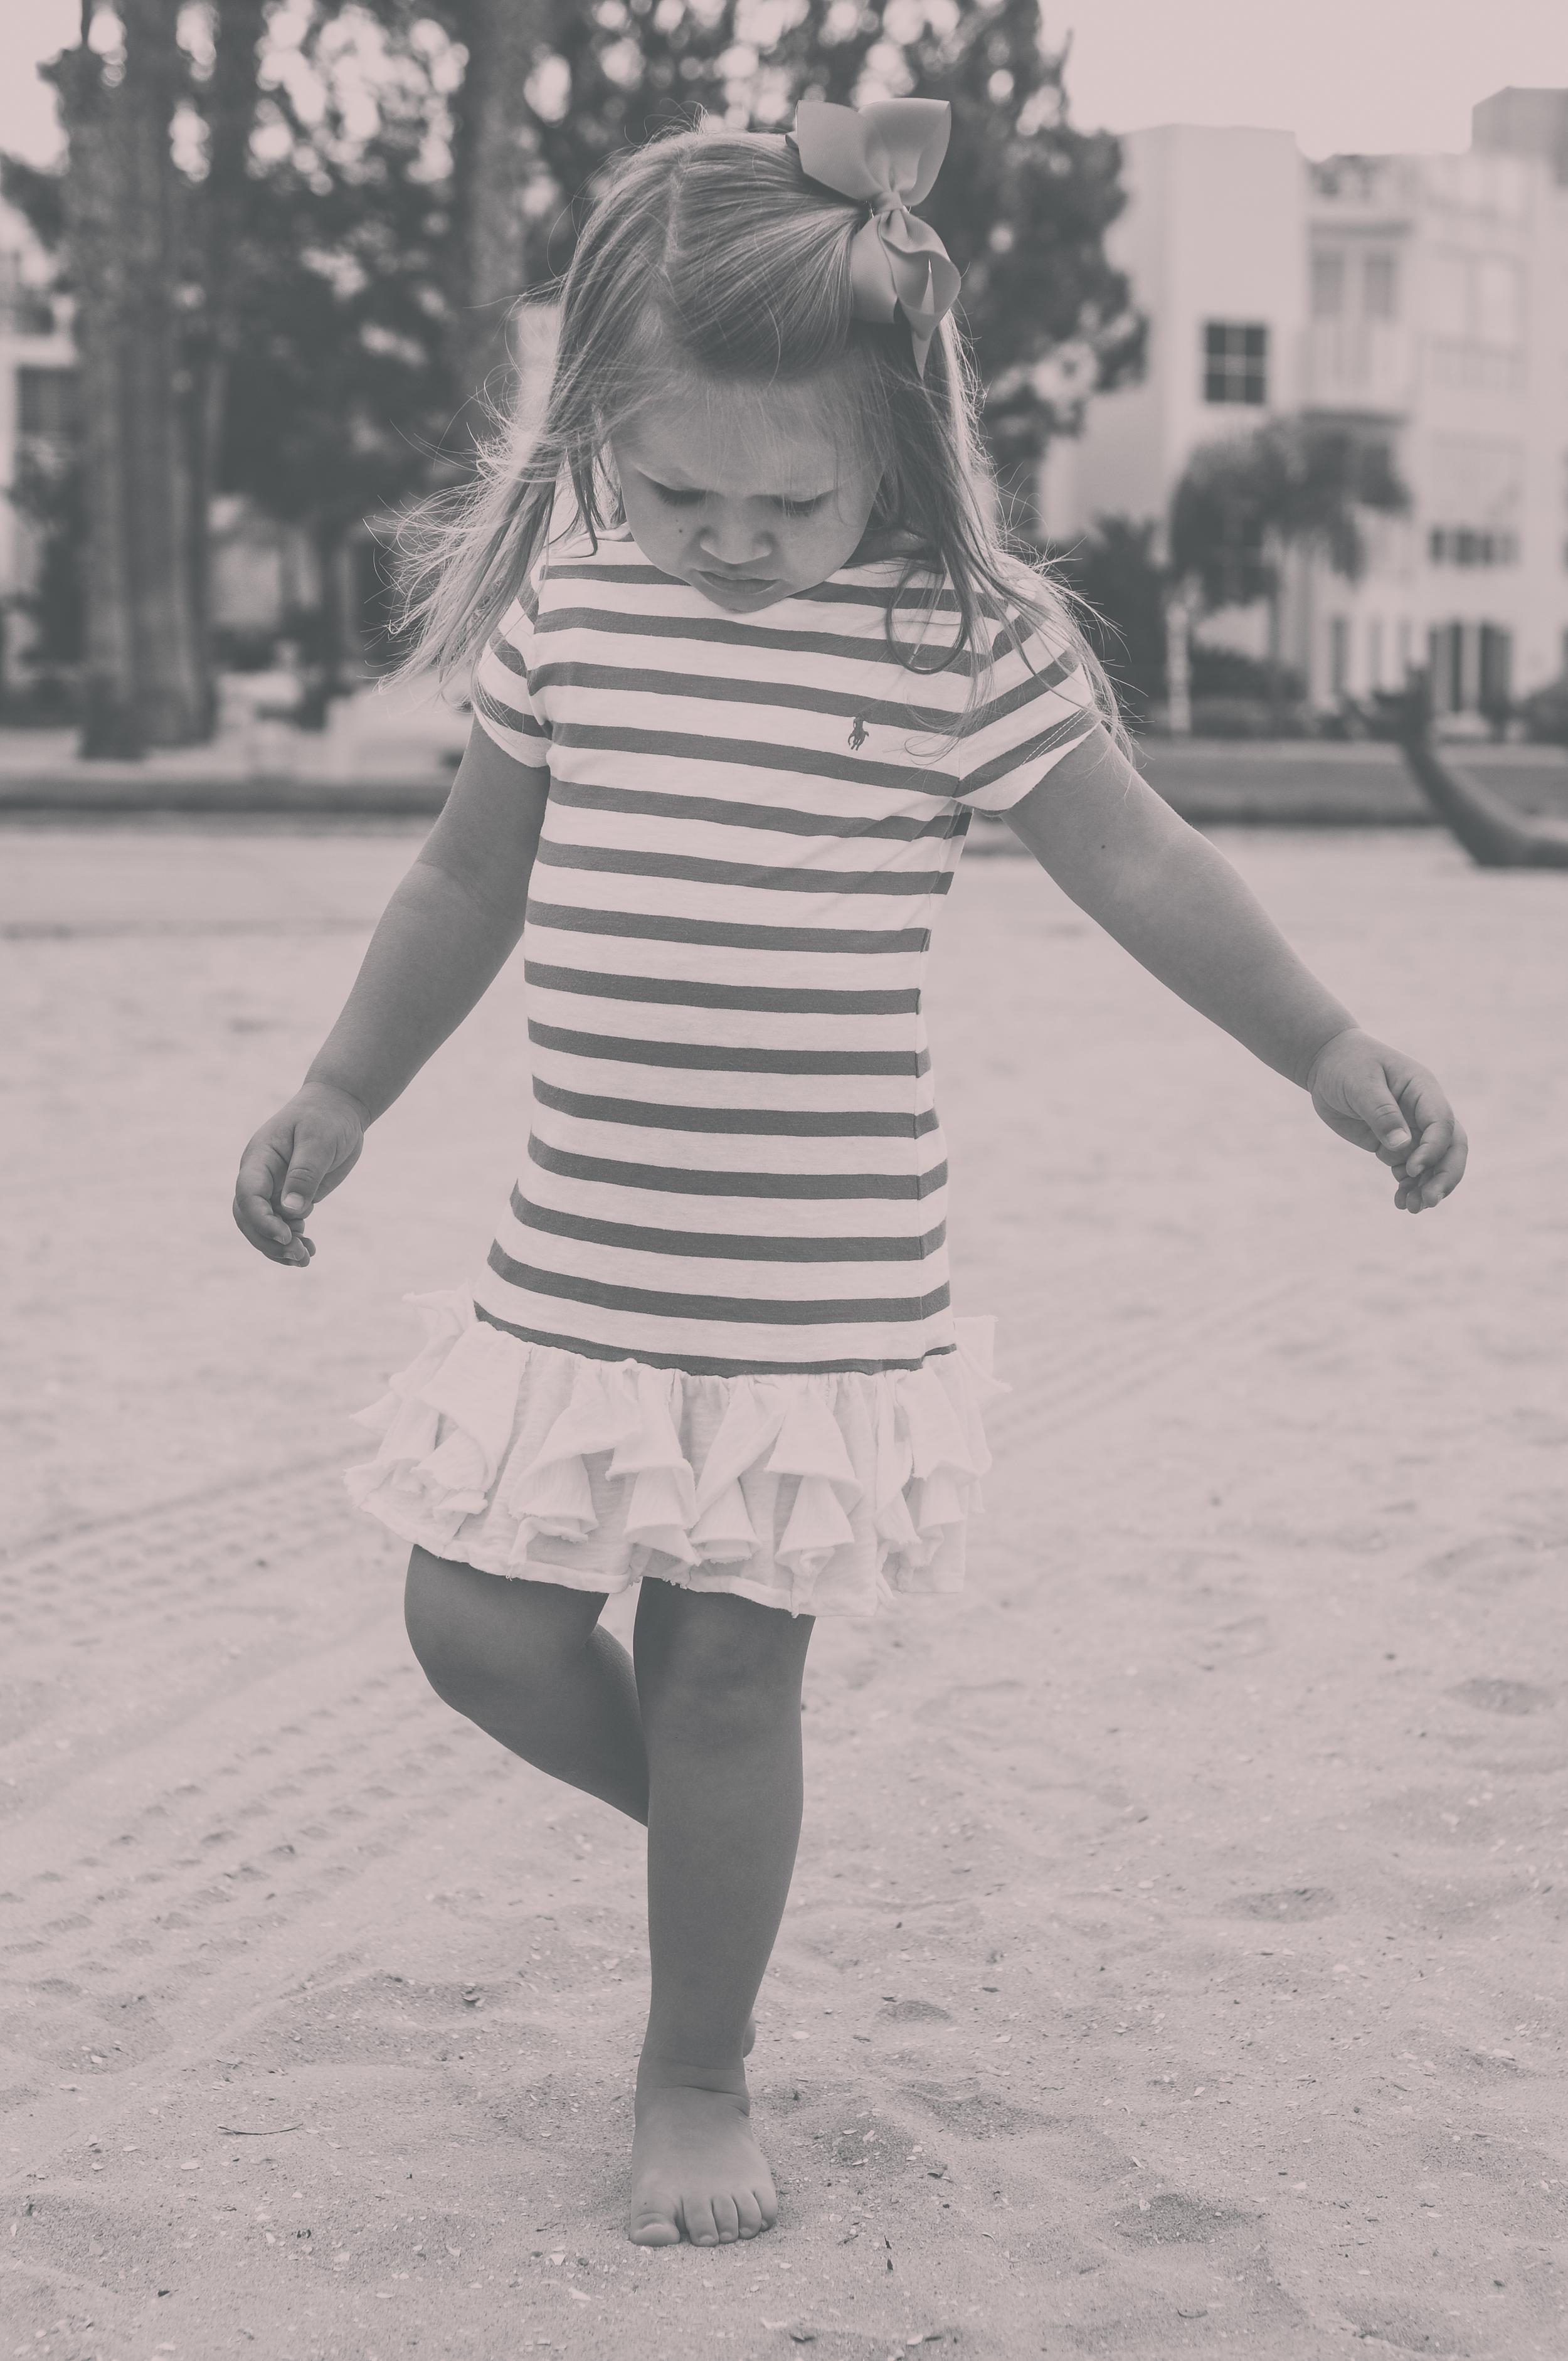 Las Vegas Children Photography